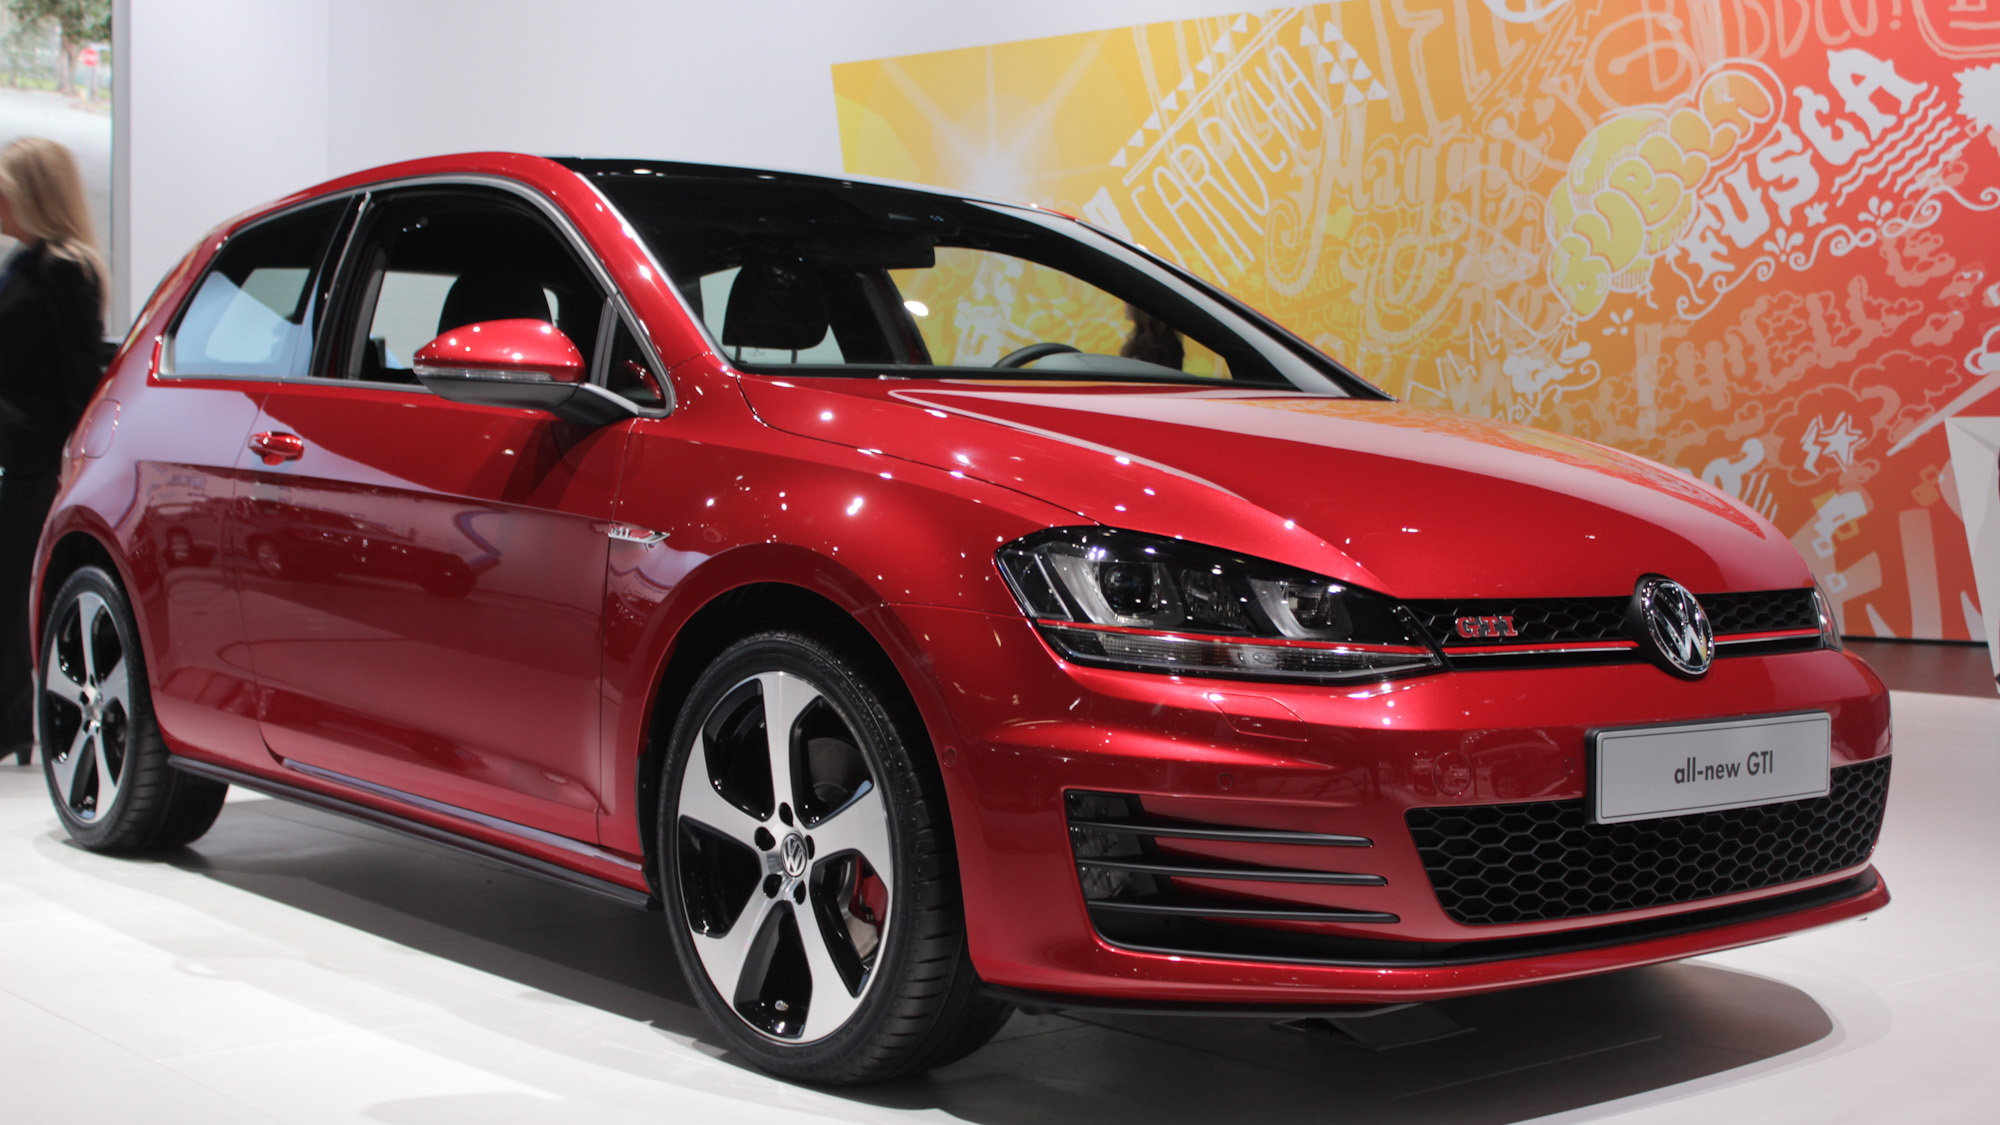 2014 Volkswagen GTI, 2013 New York Auto Show